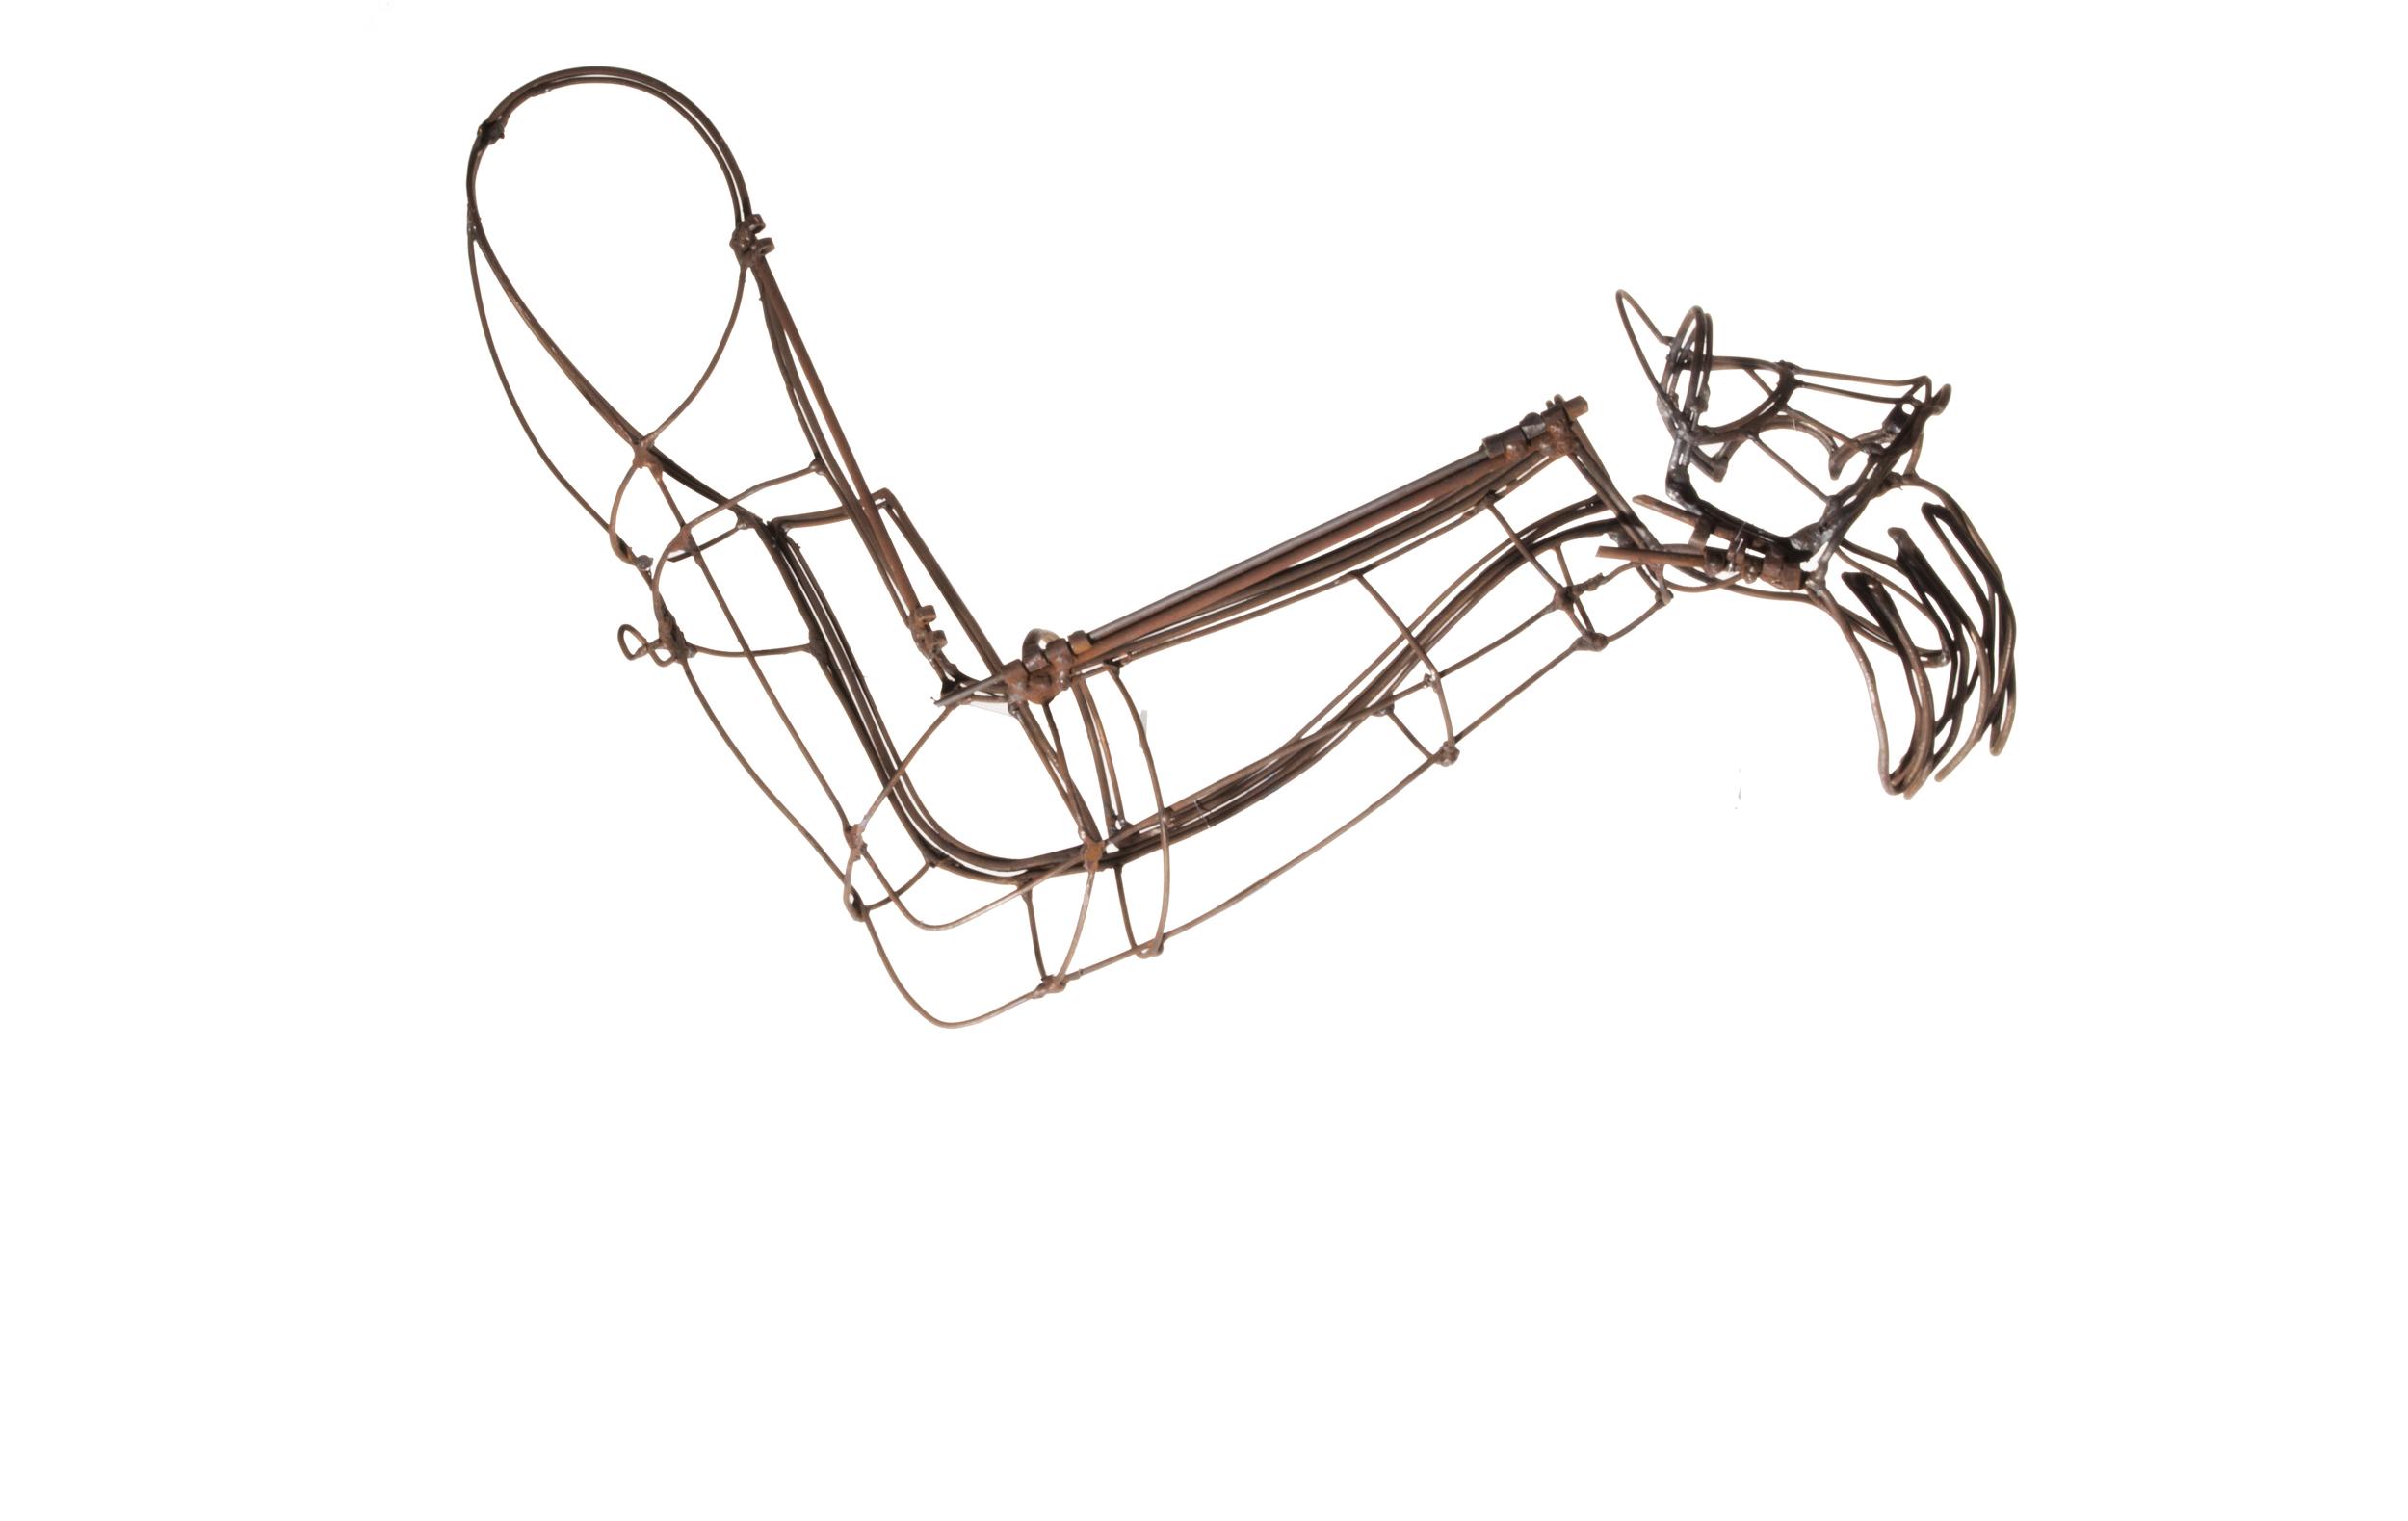 Wire Arm & Hand, no date